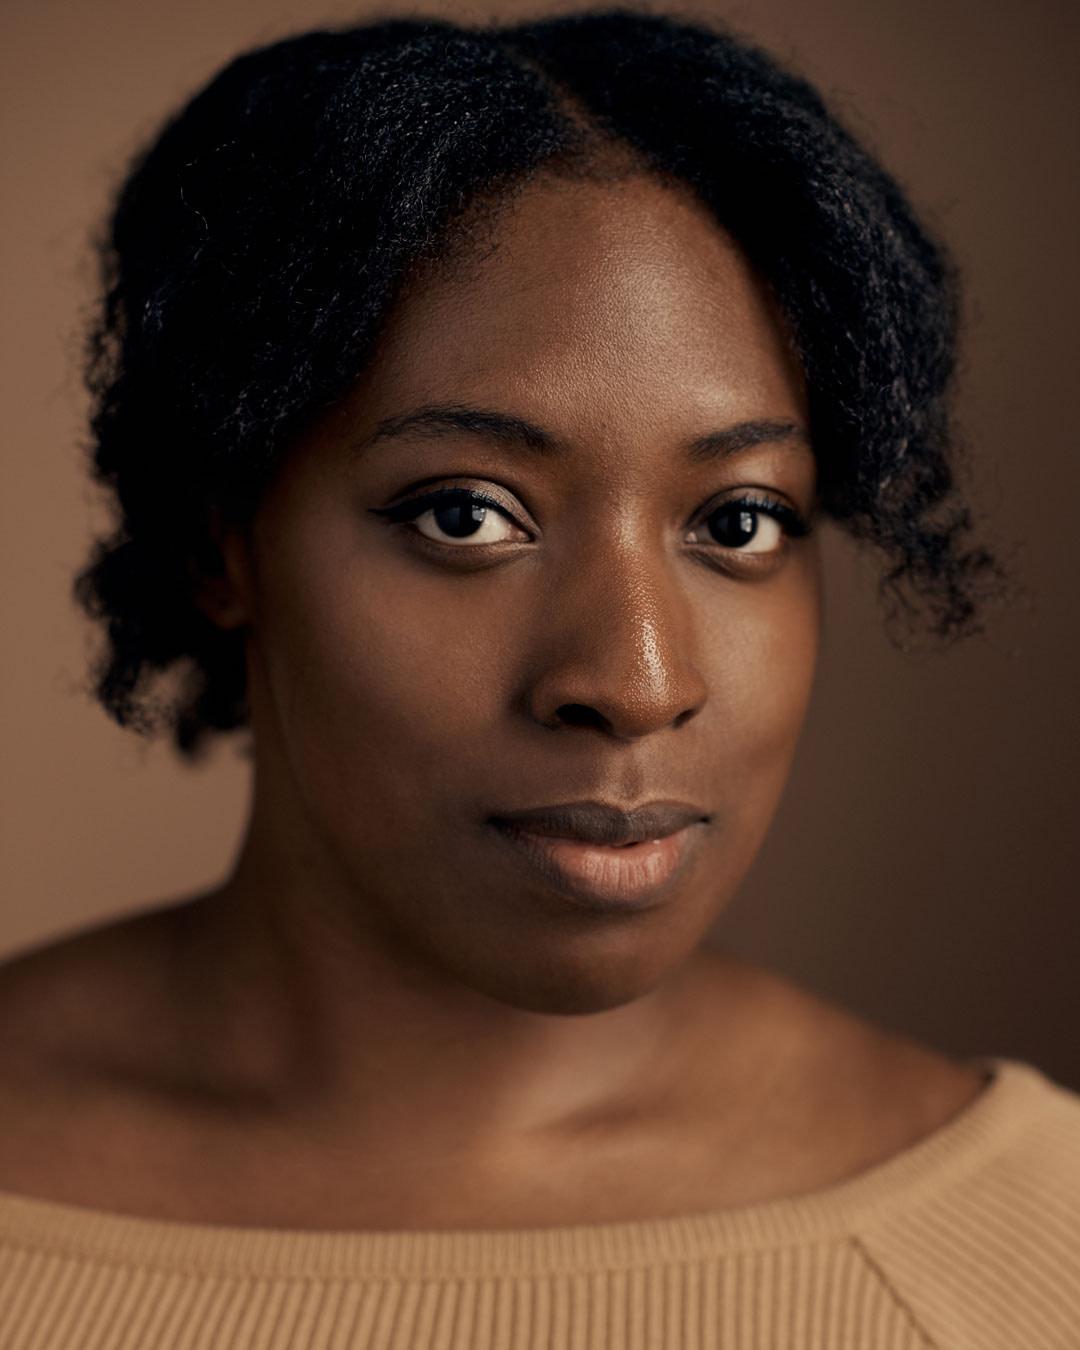 Dorcas-A-Stevens-Actor-April-Alexander-Photography-2020-5-WEB